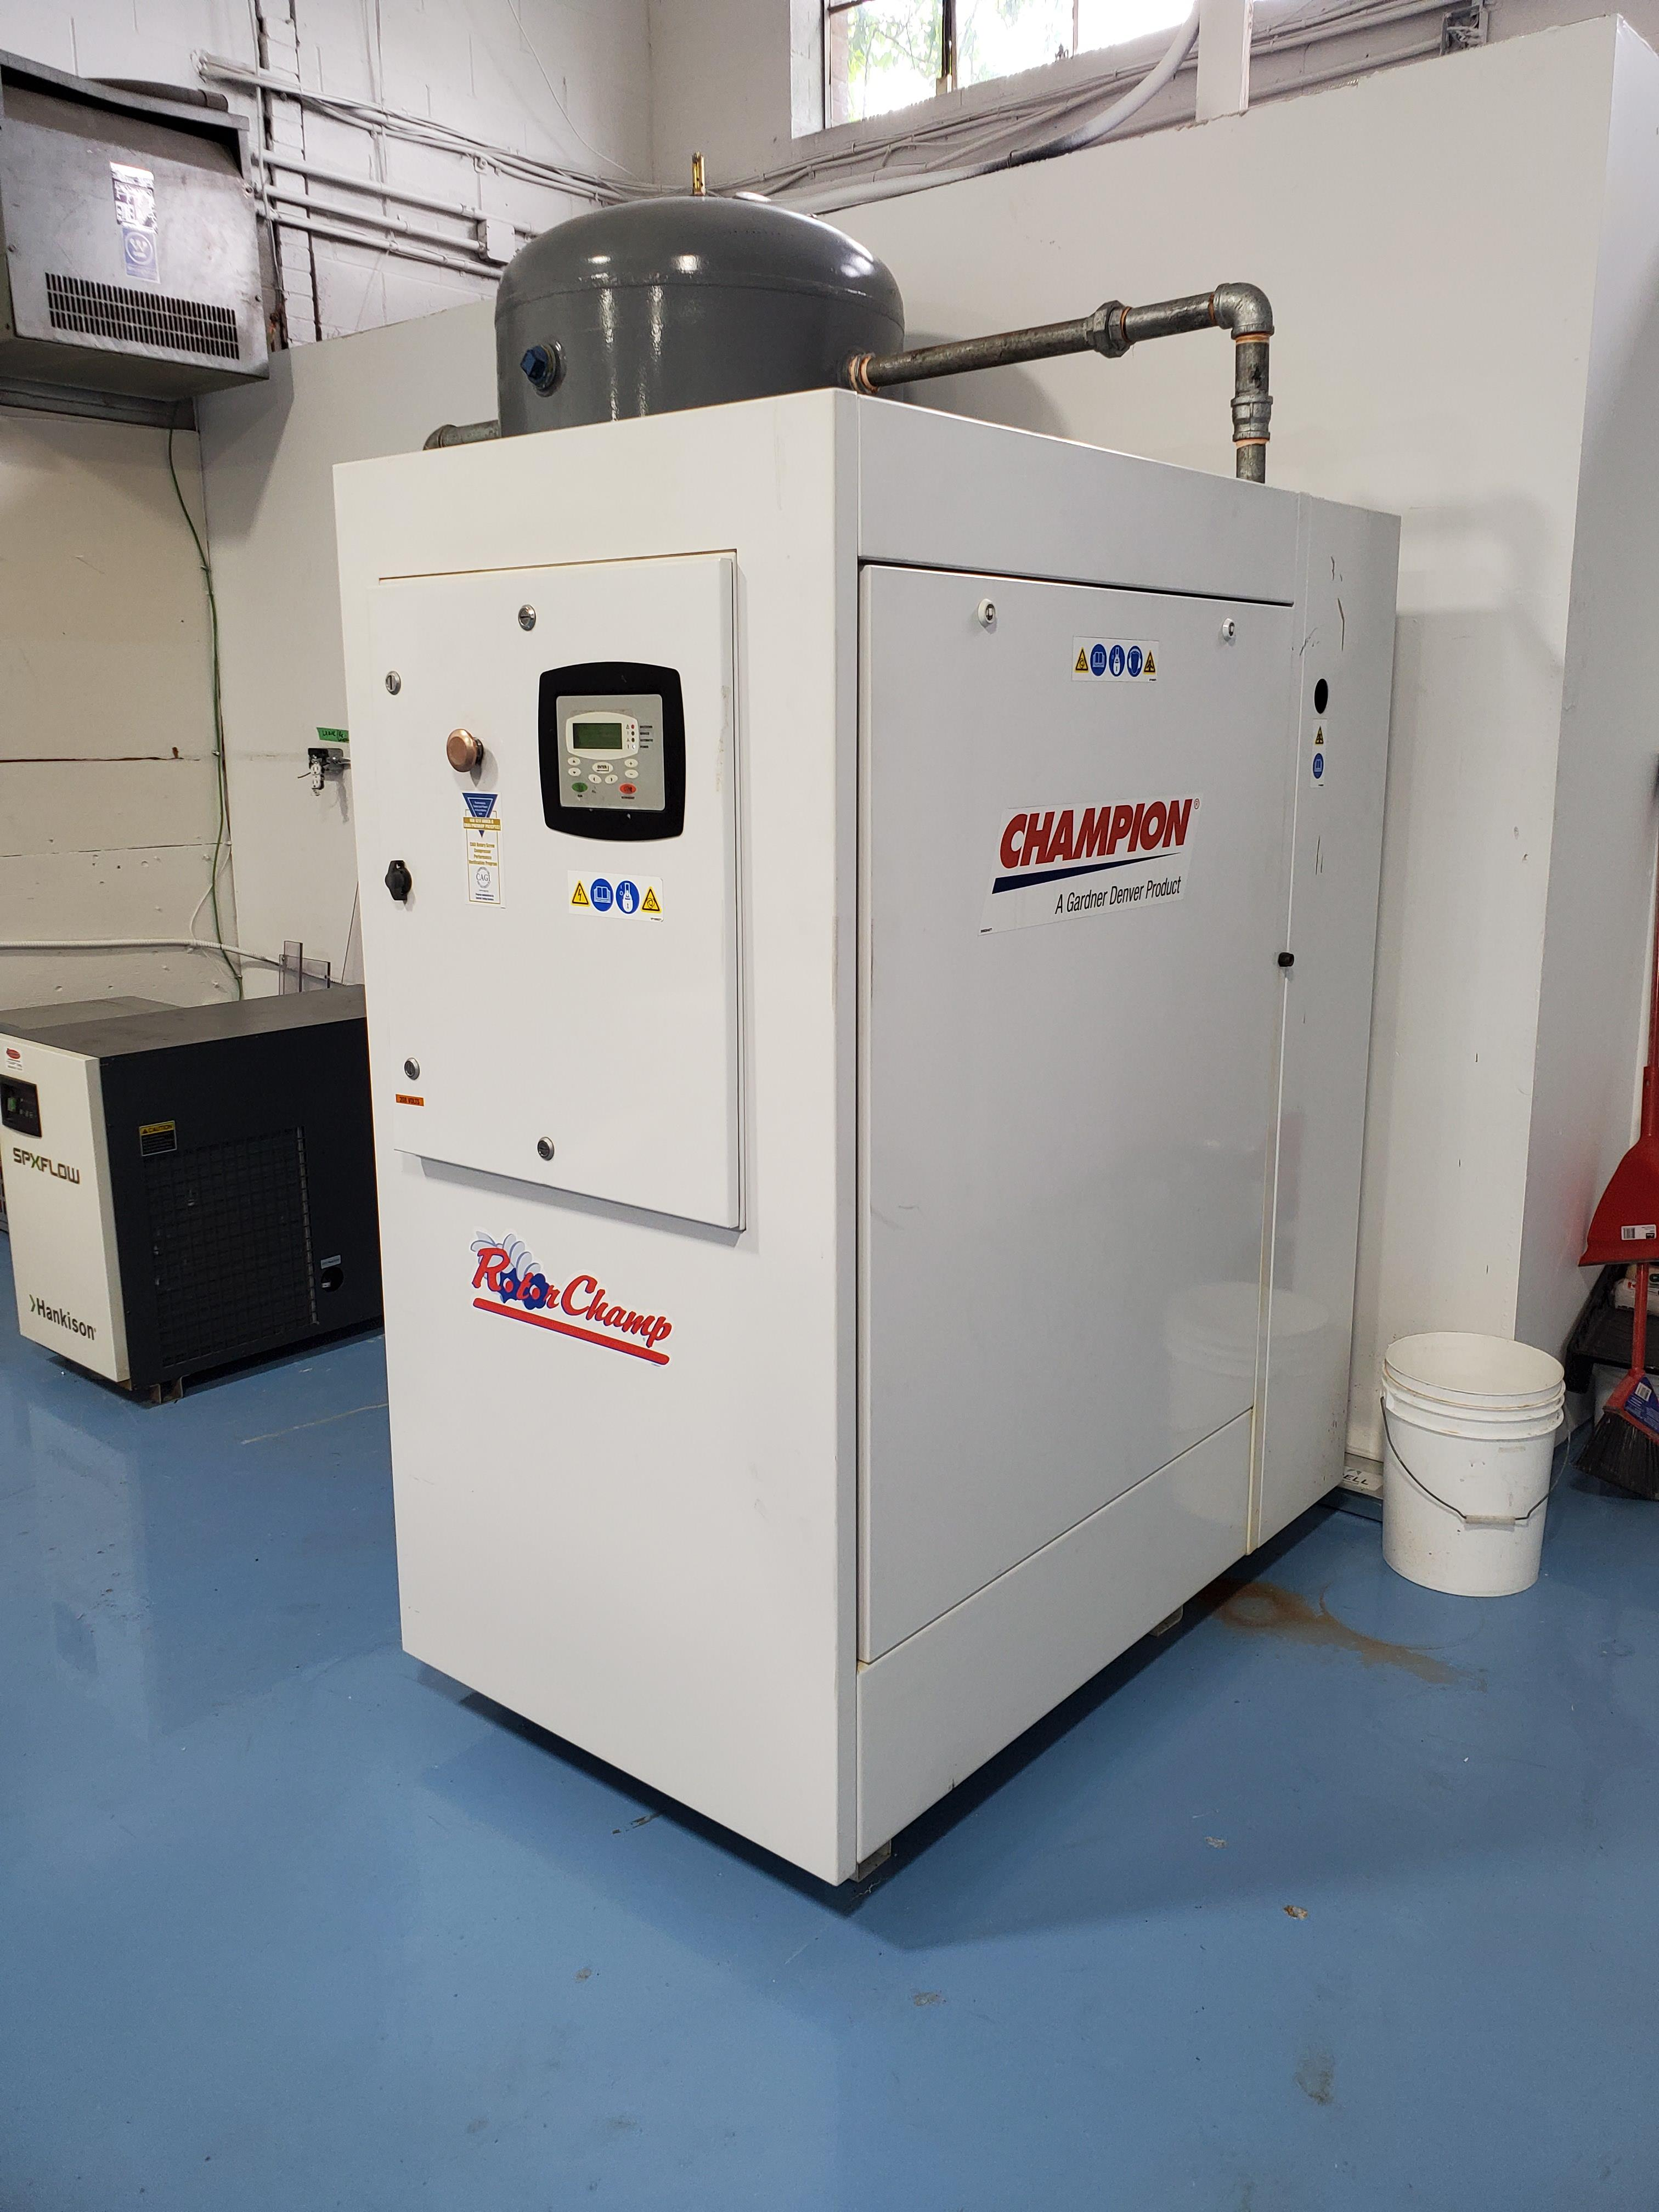 40 HP Gardner Denver CHAMPION Rotor Champ Air Compressor /w Dryer